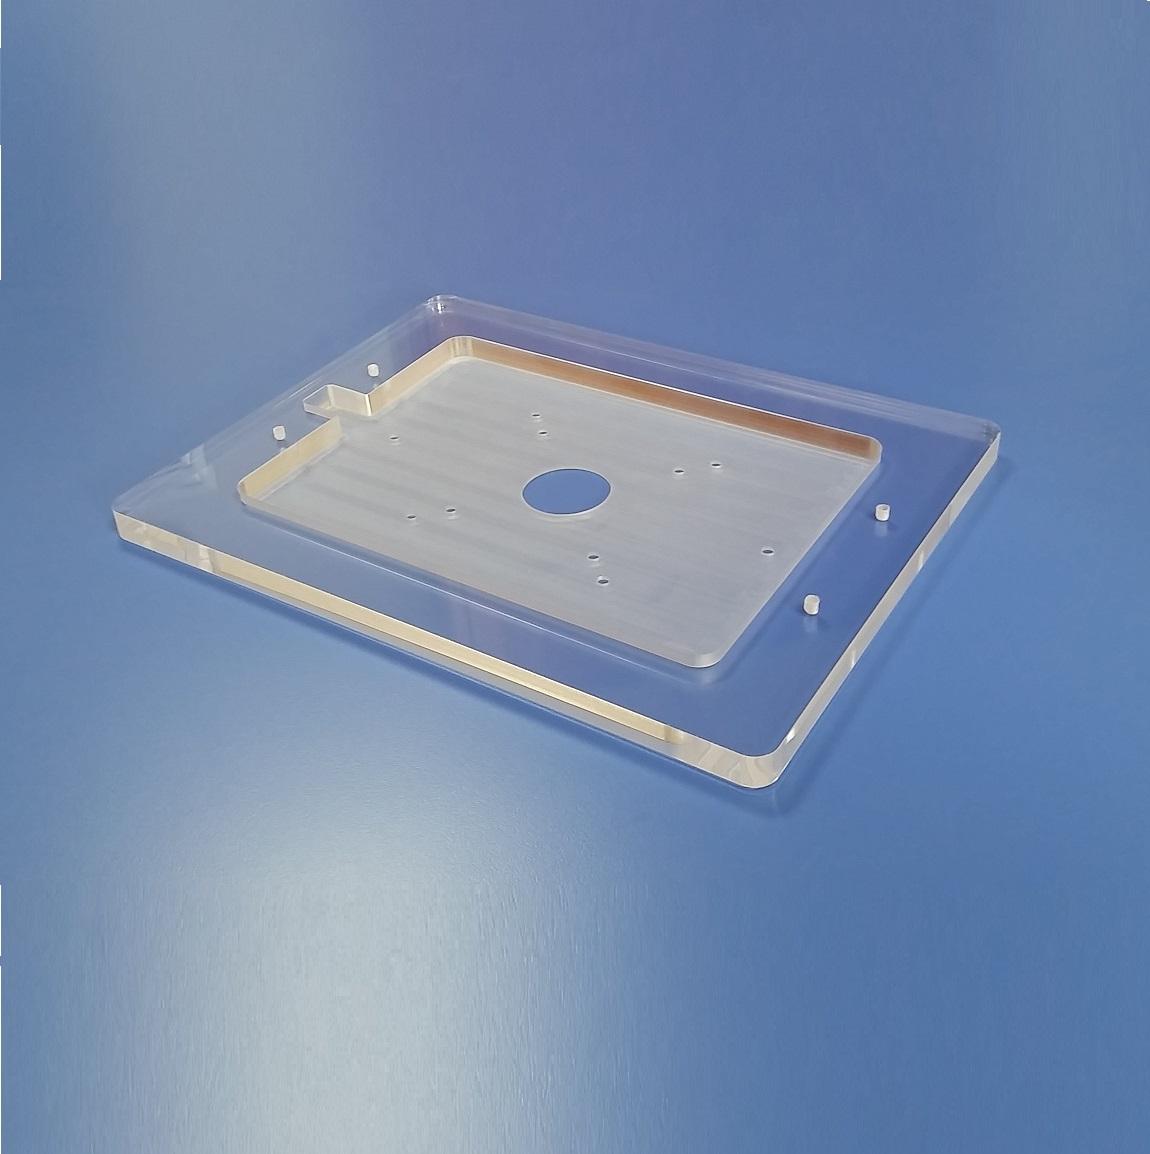 Antitaccheggio Tablet in plexiglass